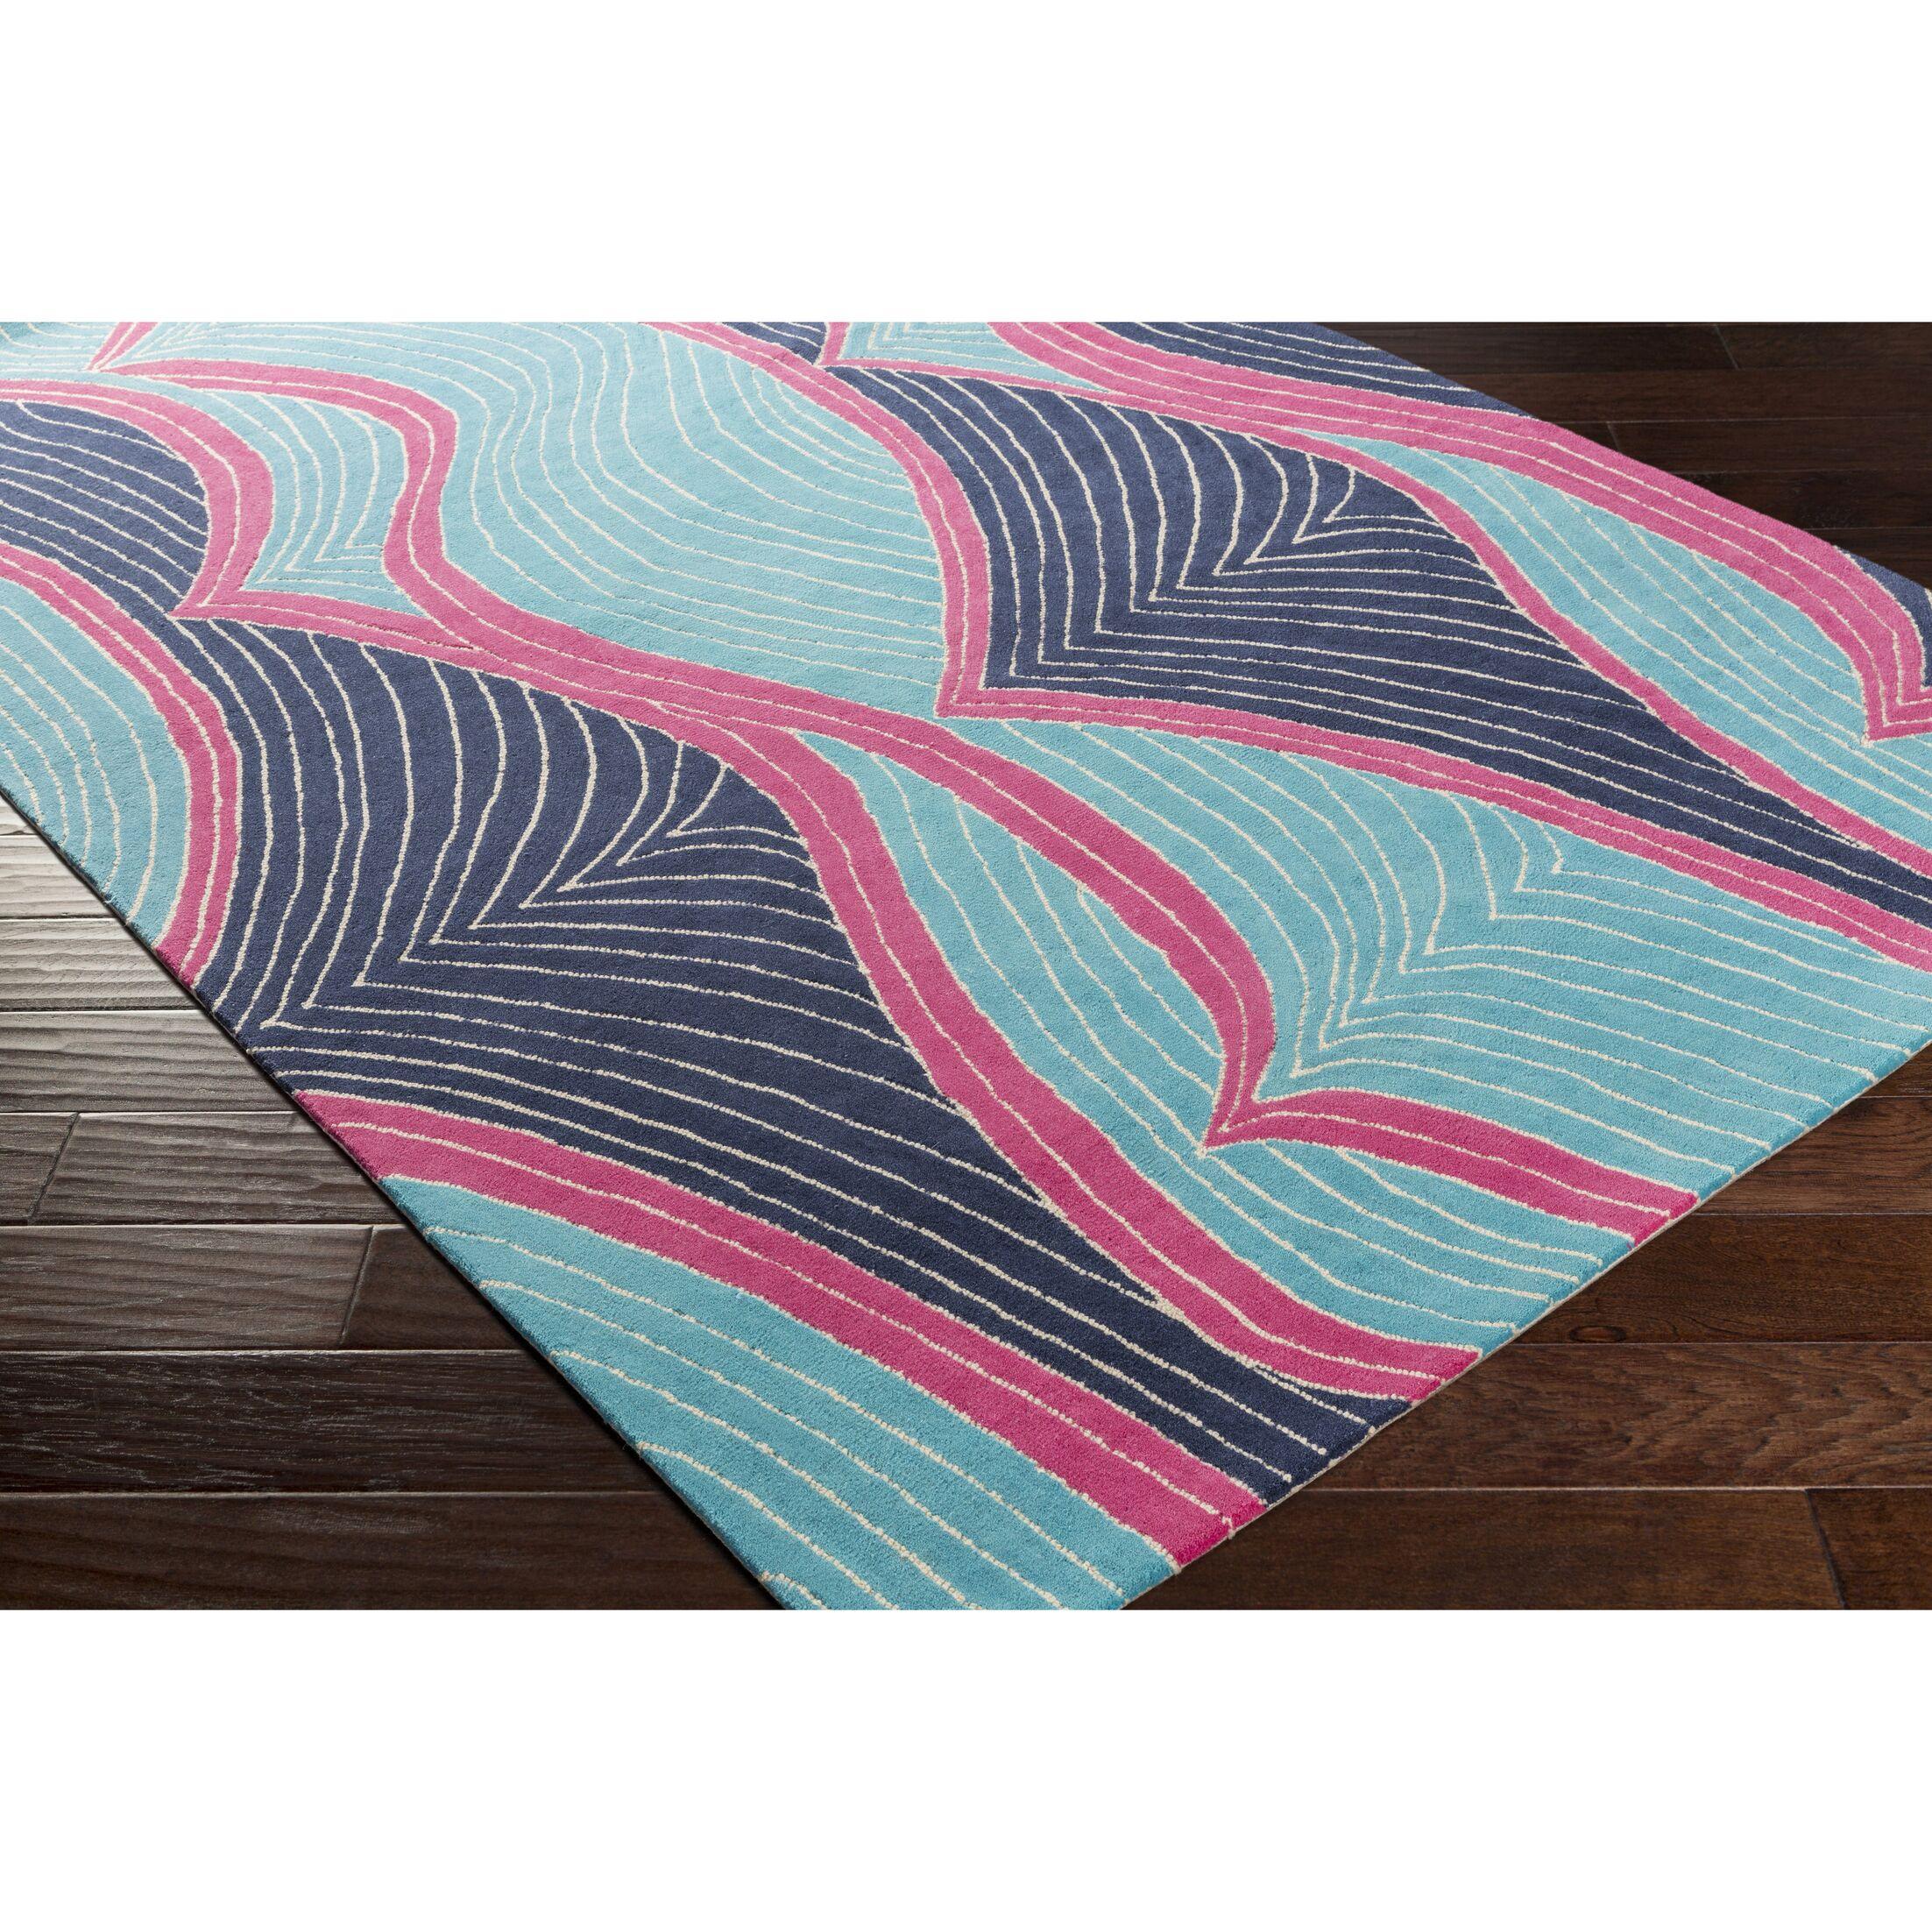 Cleo Hand-Tufted Blue/Purple Area Rug Rug Size: Rectangle 7'6